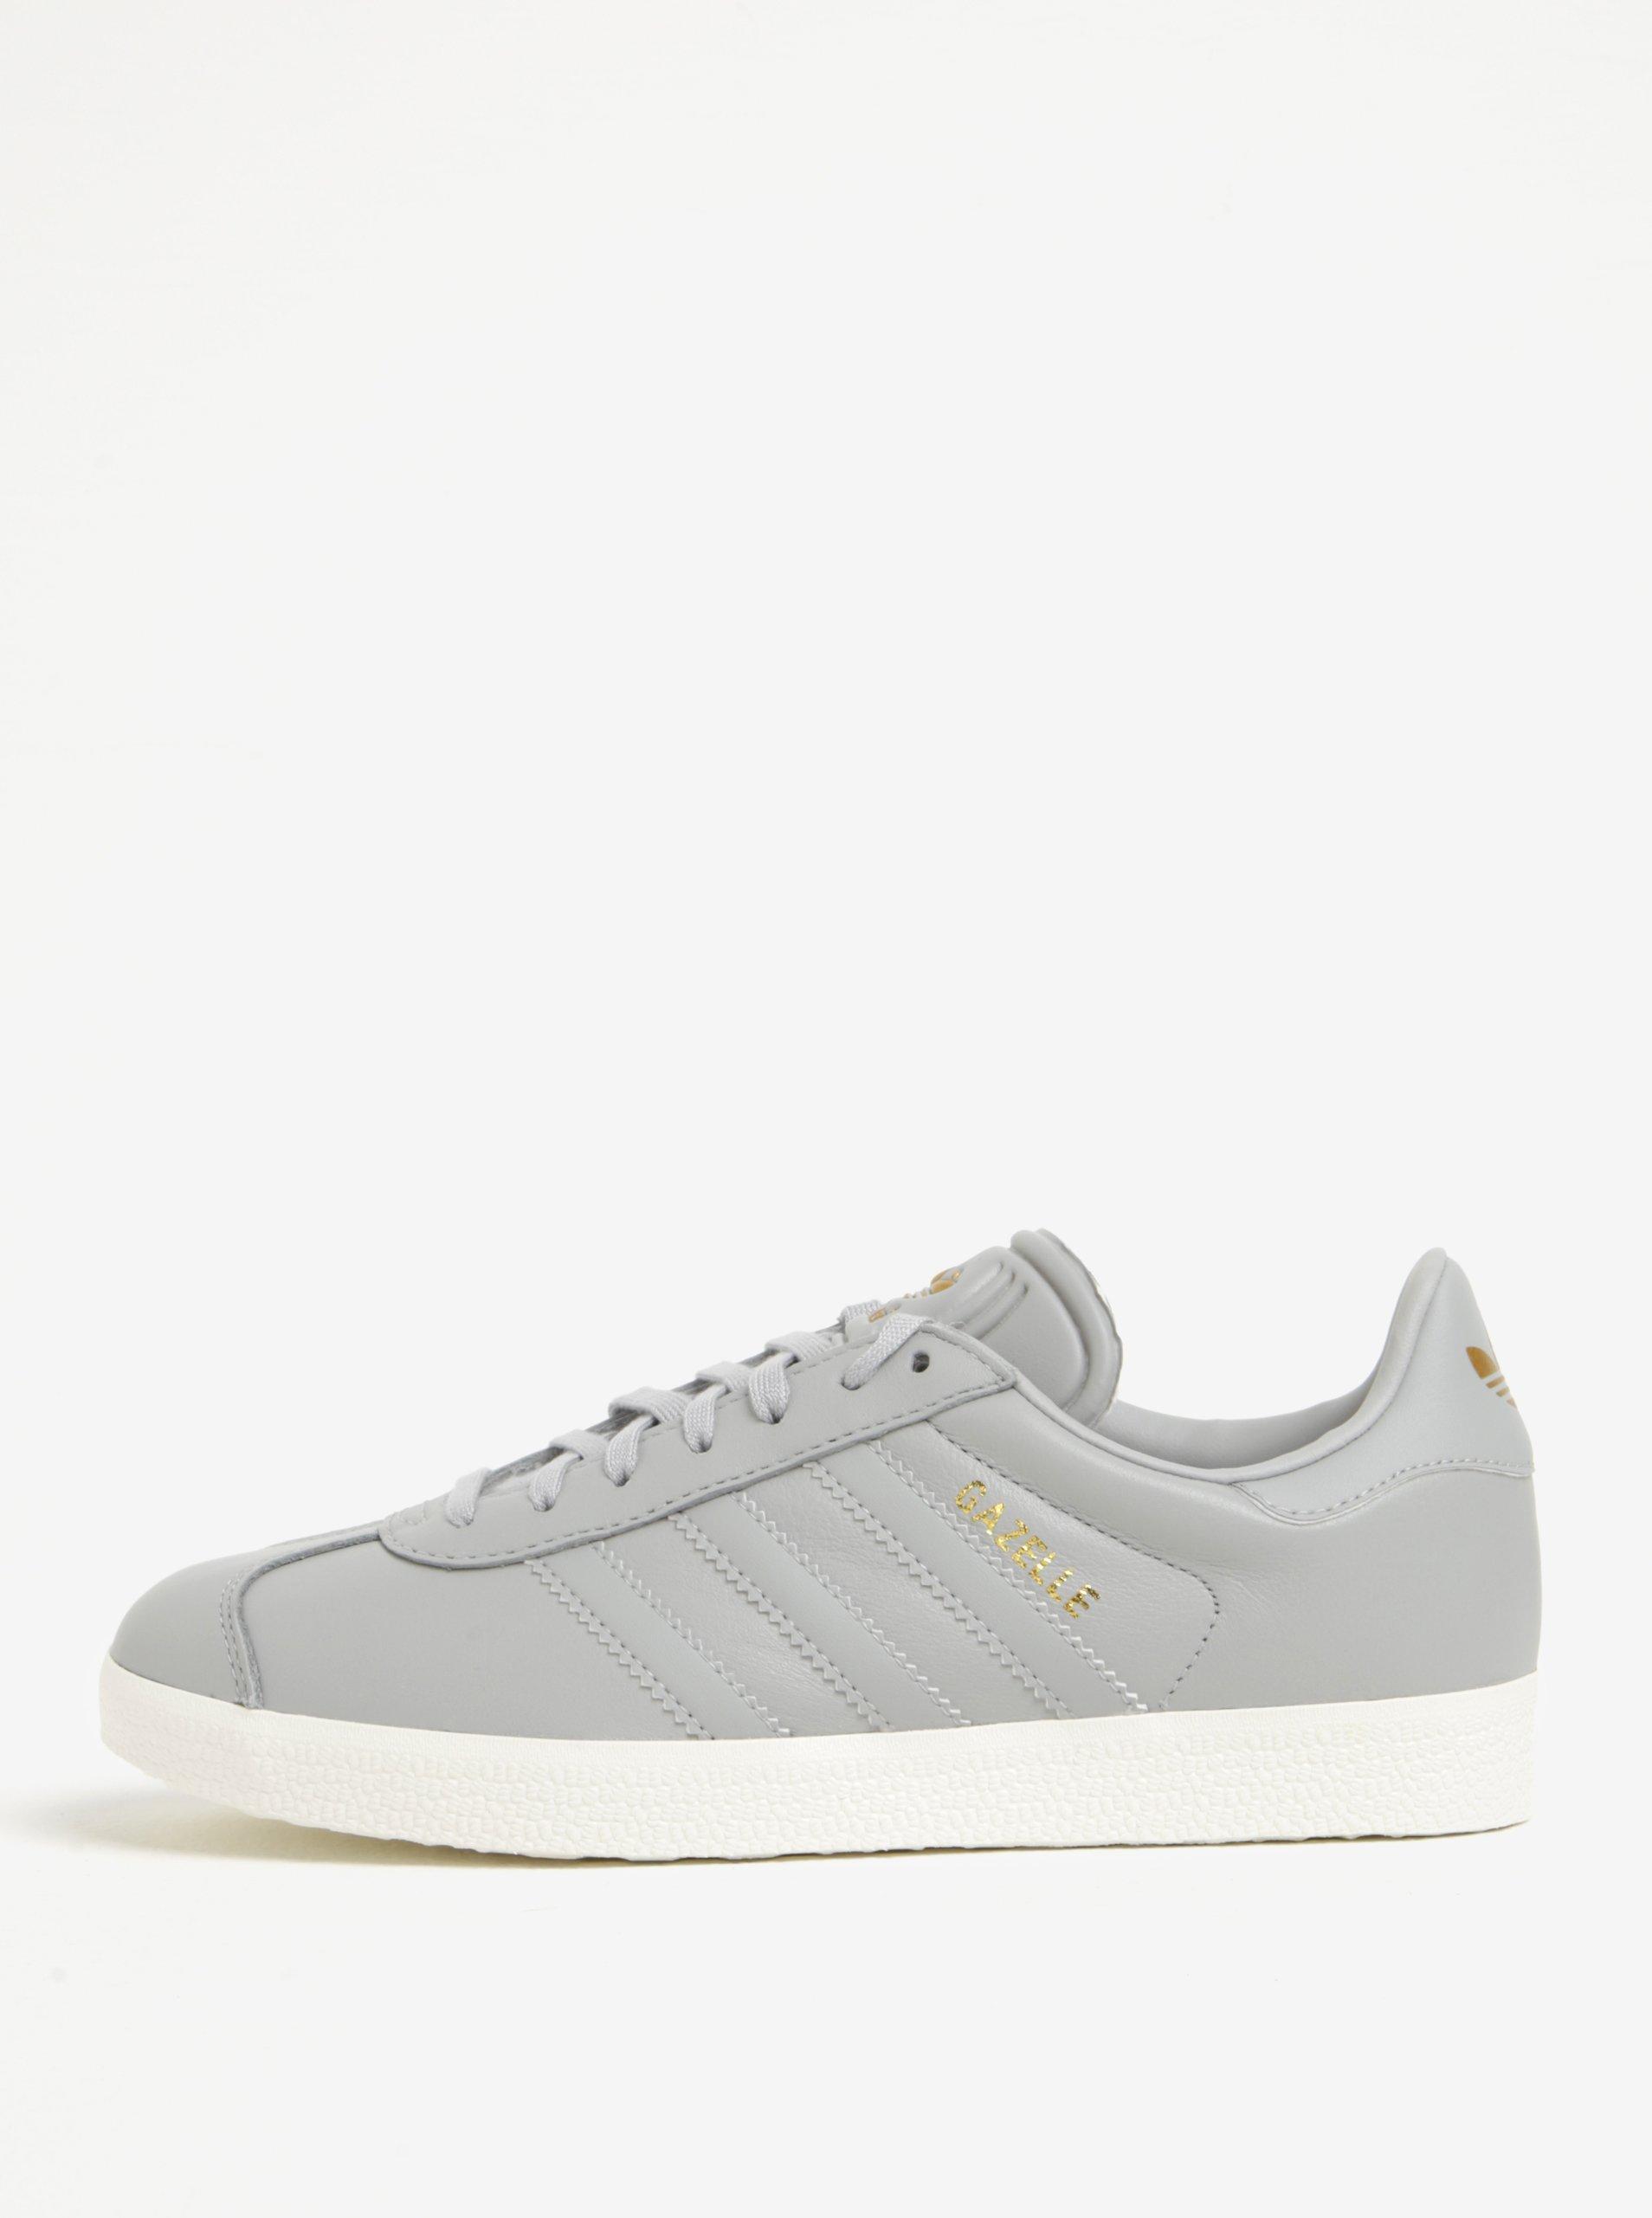 Šedé dámské tenisky adidas Originals Gazelle